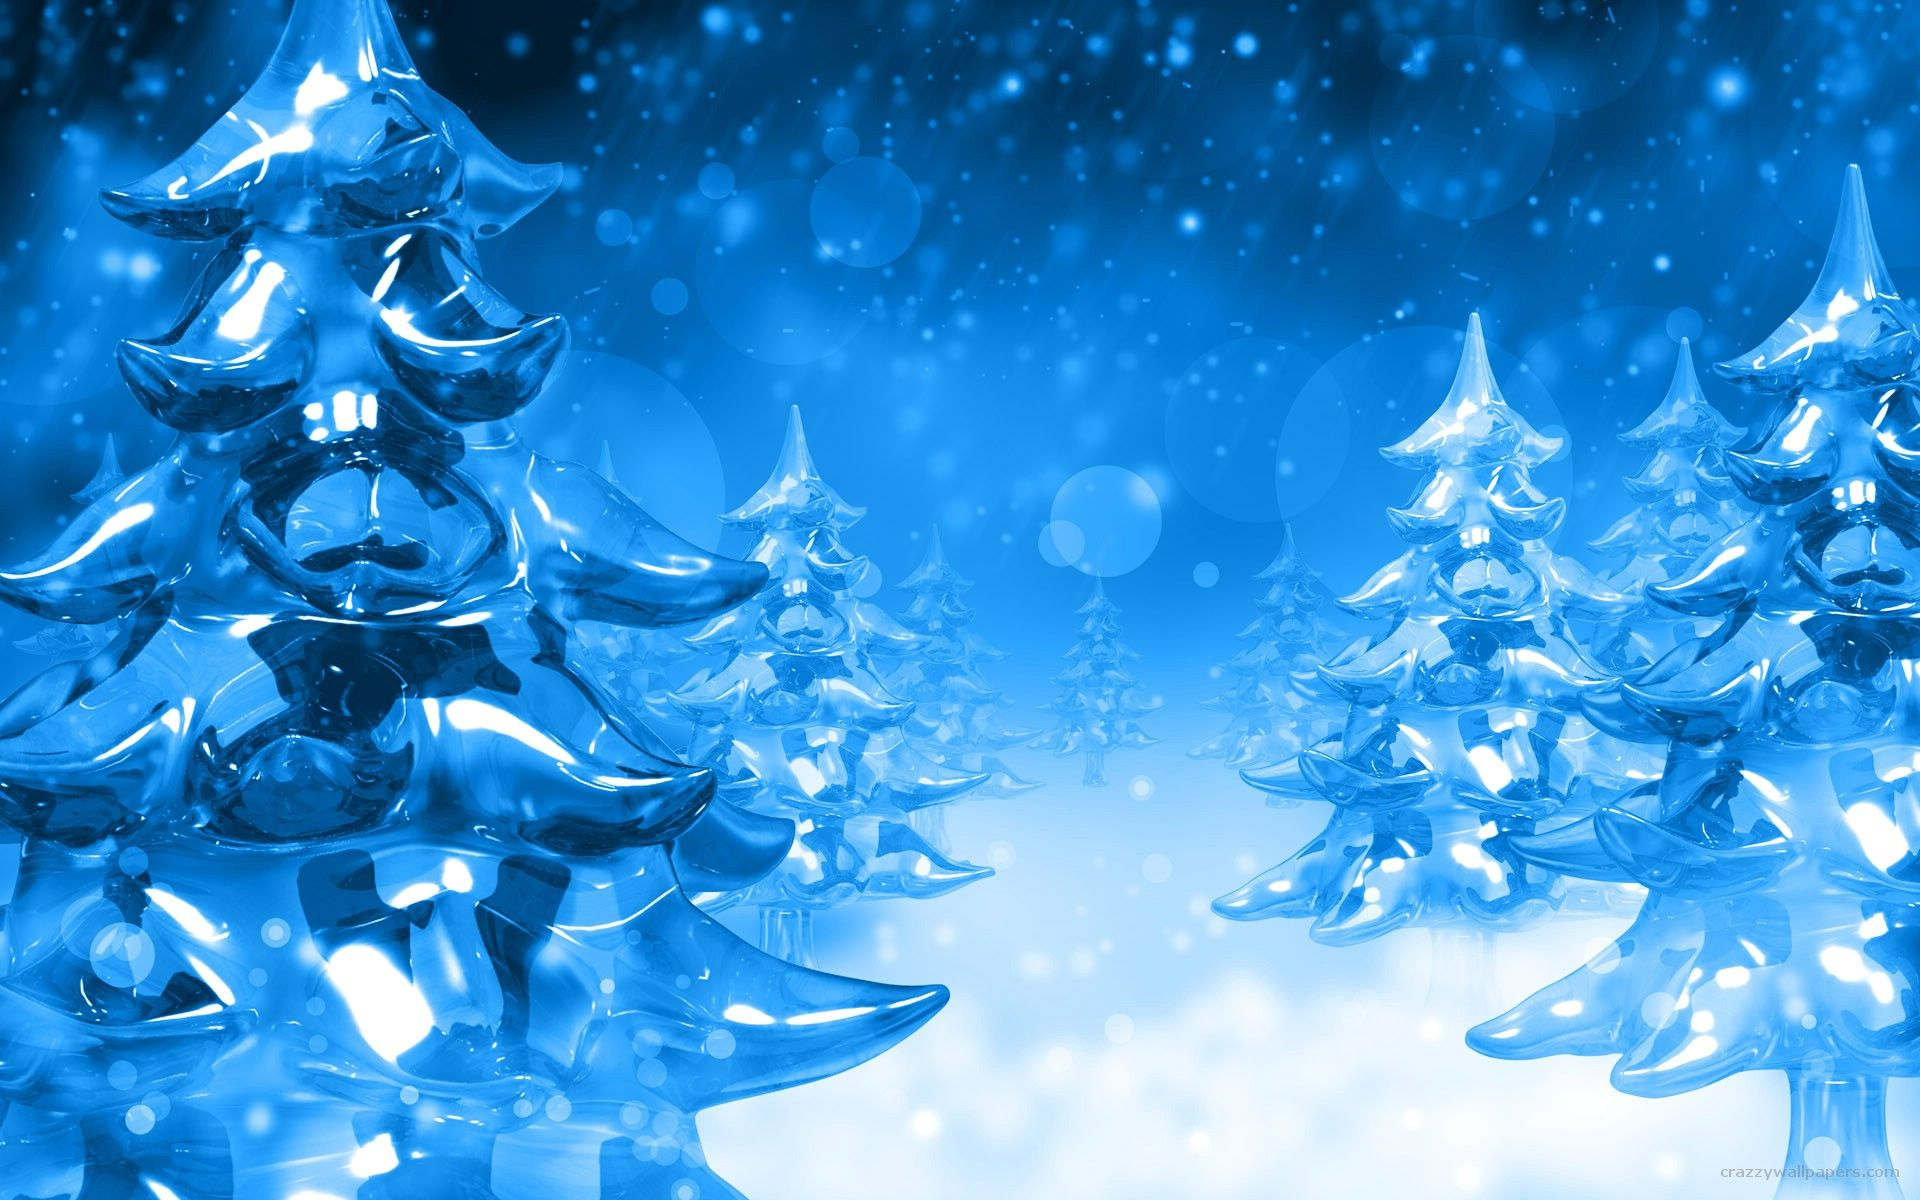 Christmas Tree Blue Snow Cold Digital Art Winter Christmas Wallpaper Free Christmas Wallpaper Hd Christmas Tree Wallpaper